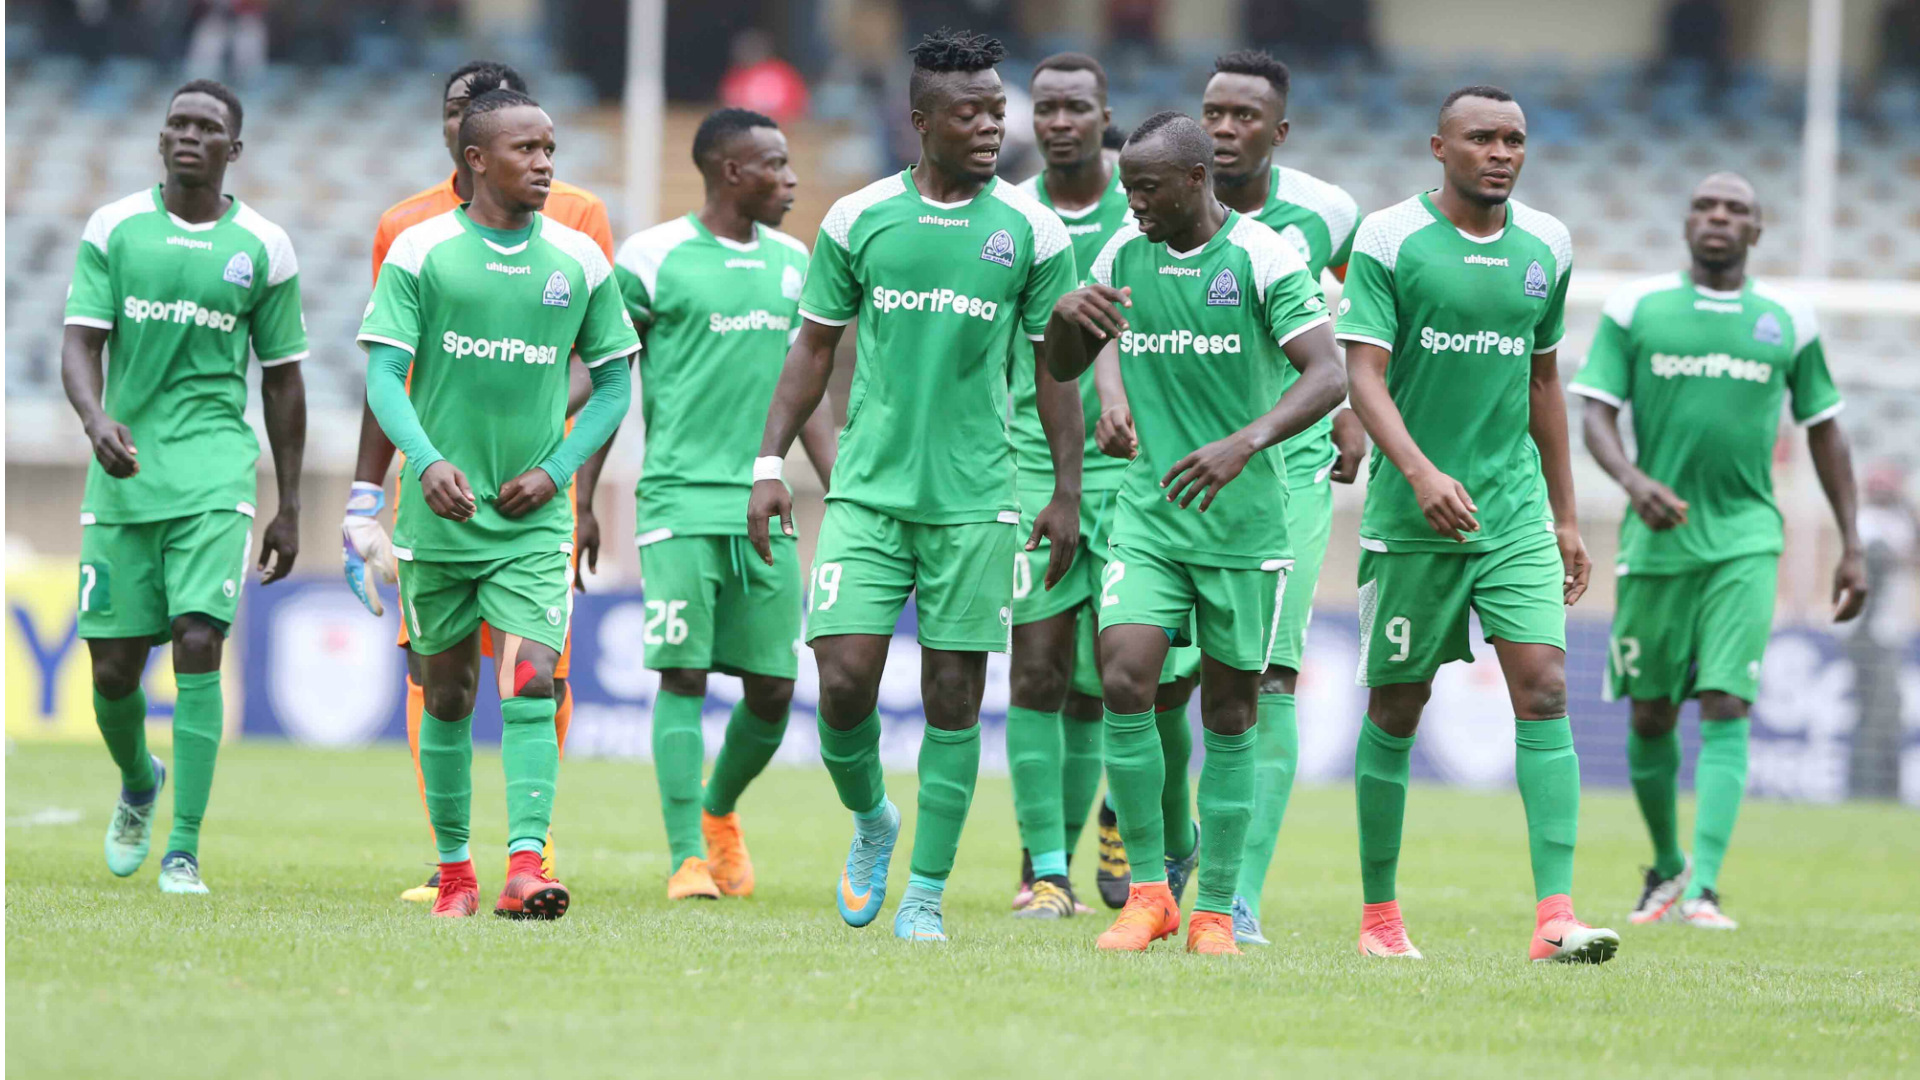 Kenyan football club Gor Mahia board elections to go ahead - Sports Leo